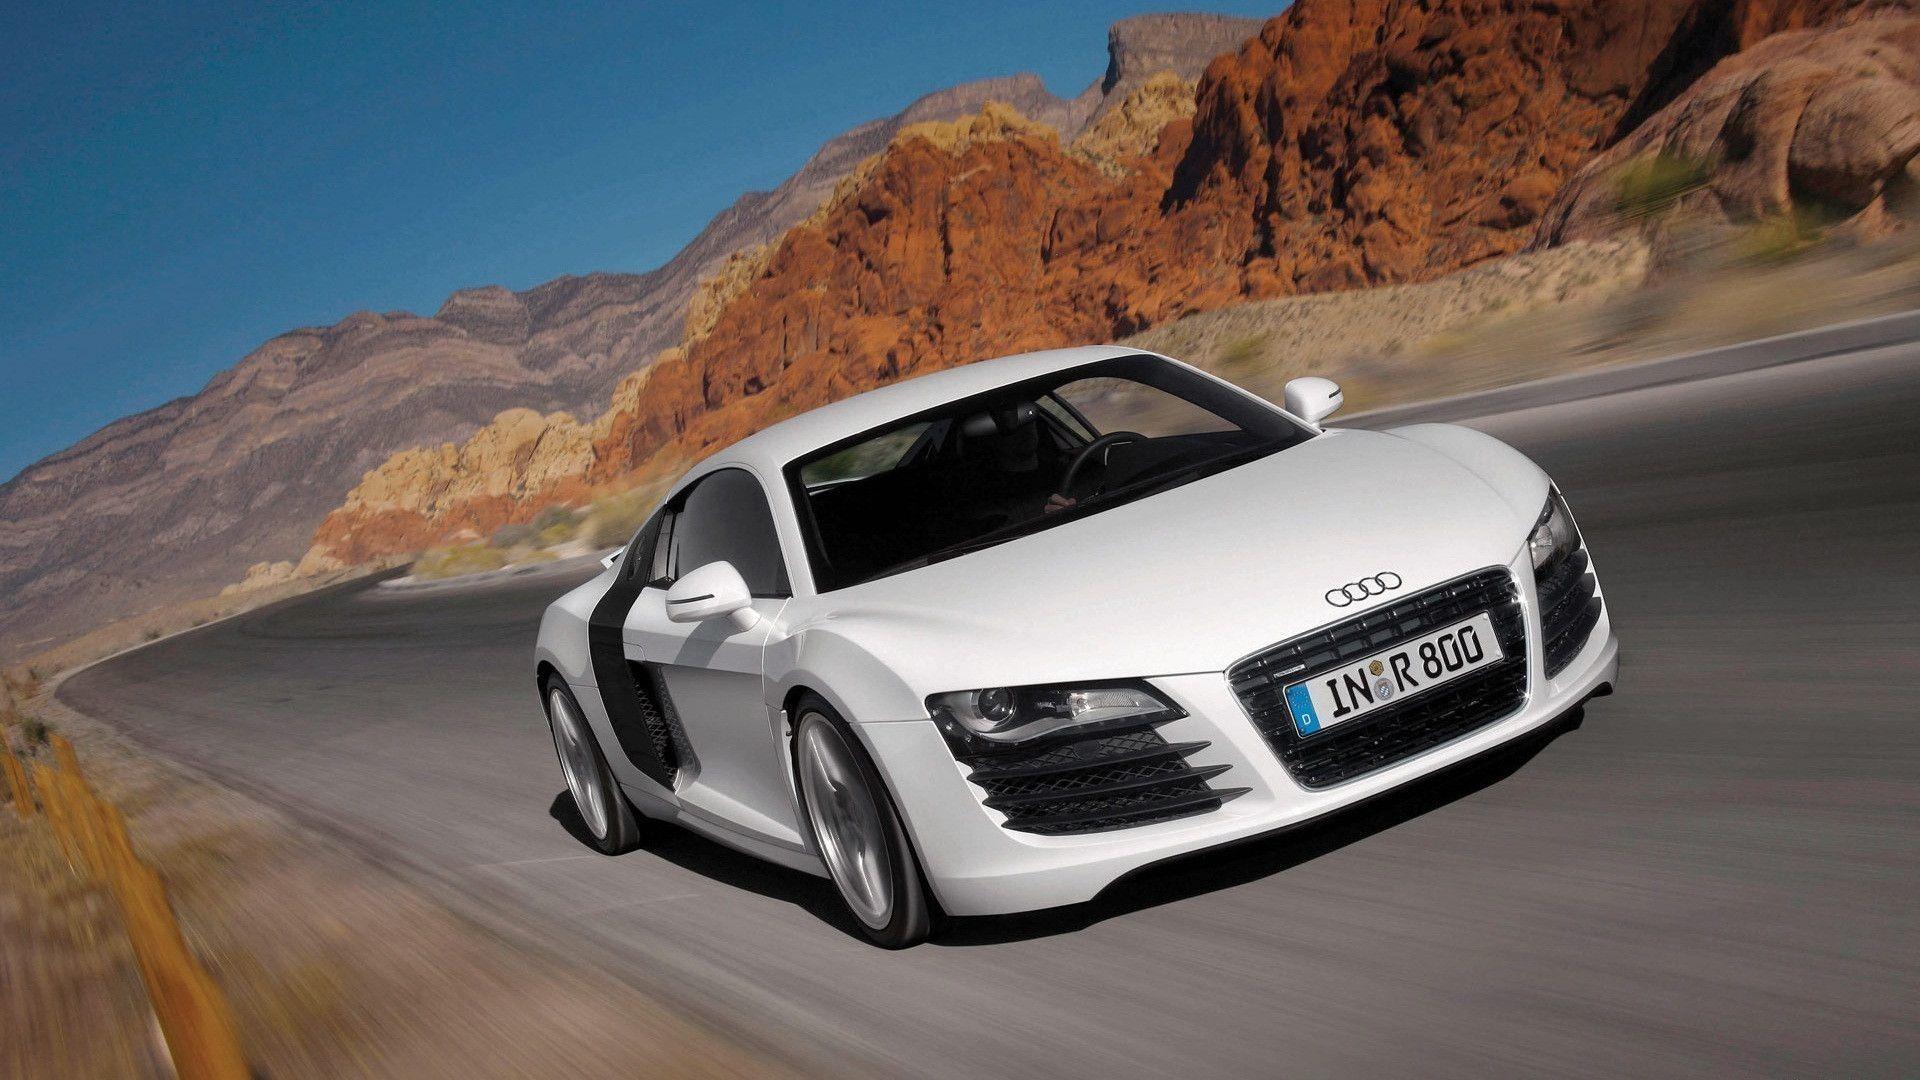 Superbe 1920x1080 Audi R8 Hd Wallpapers #439 | Cars Wallpaper